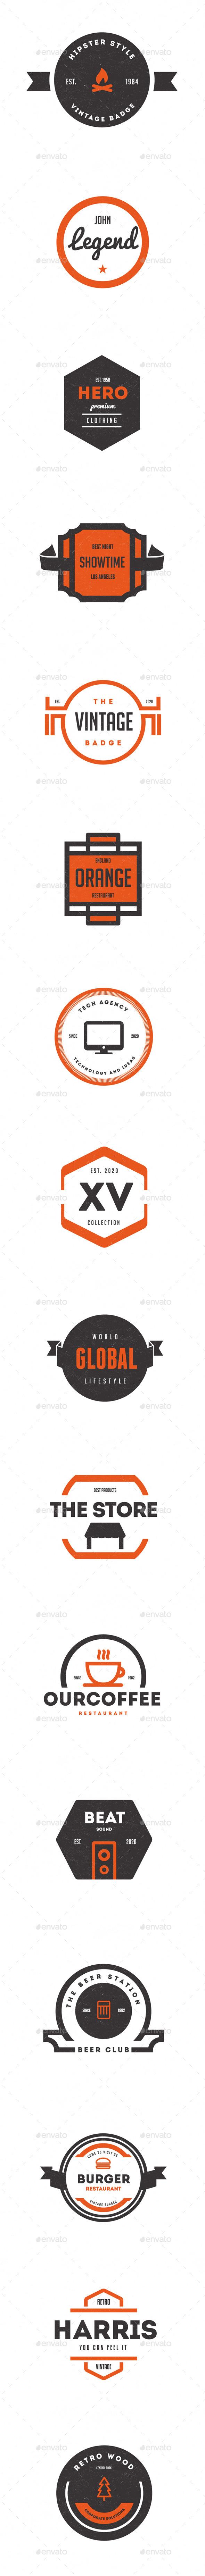 Trendy Vintage Logos, Labels & Badges - Badges & Stickers Web Elements